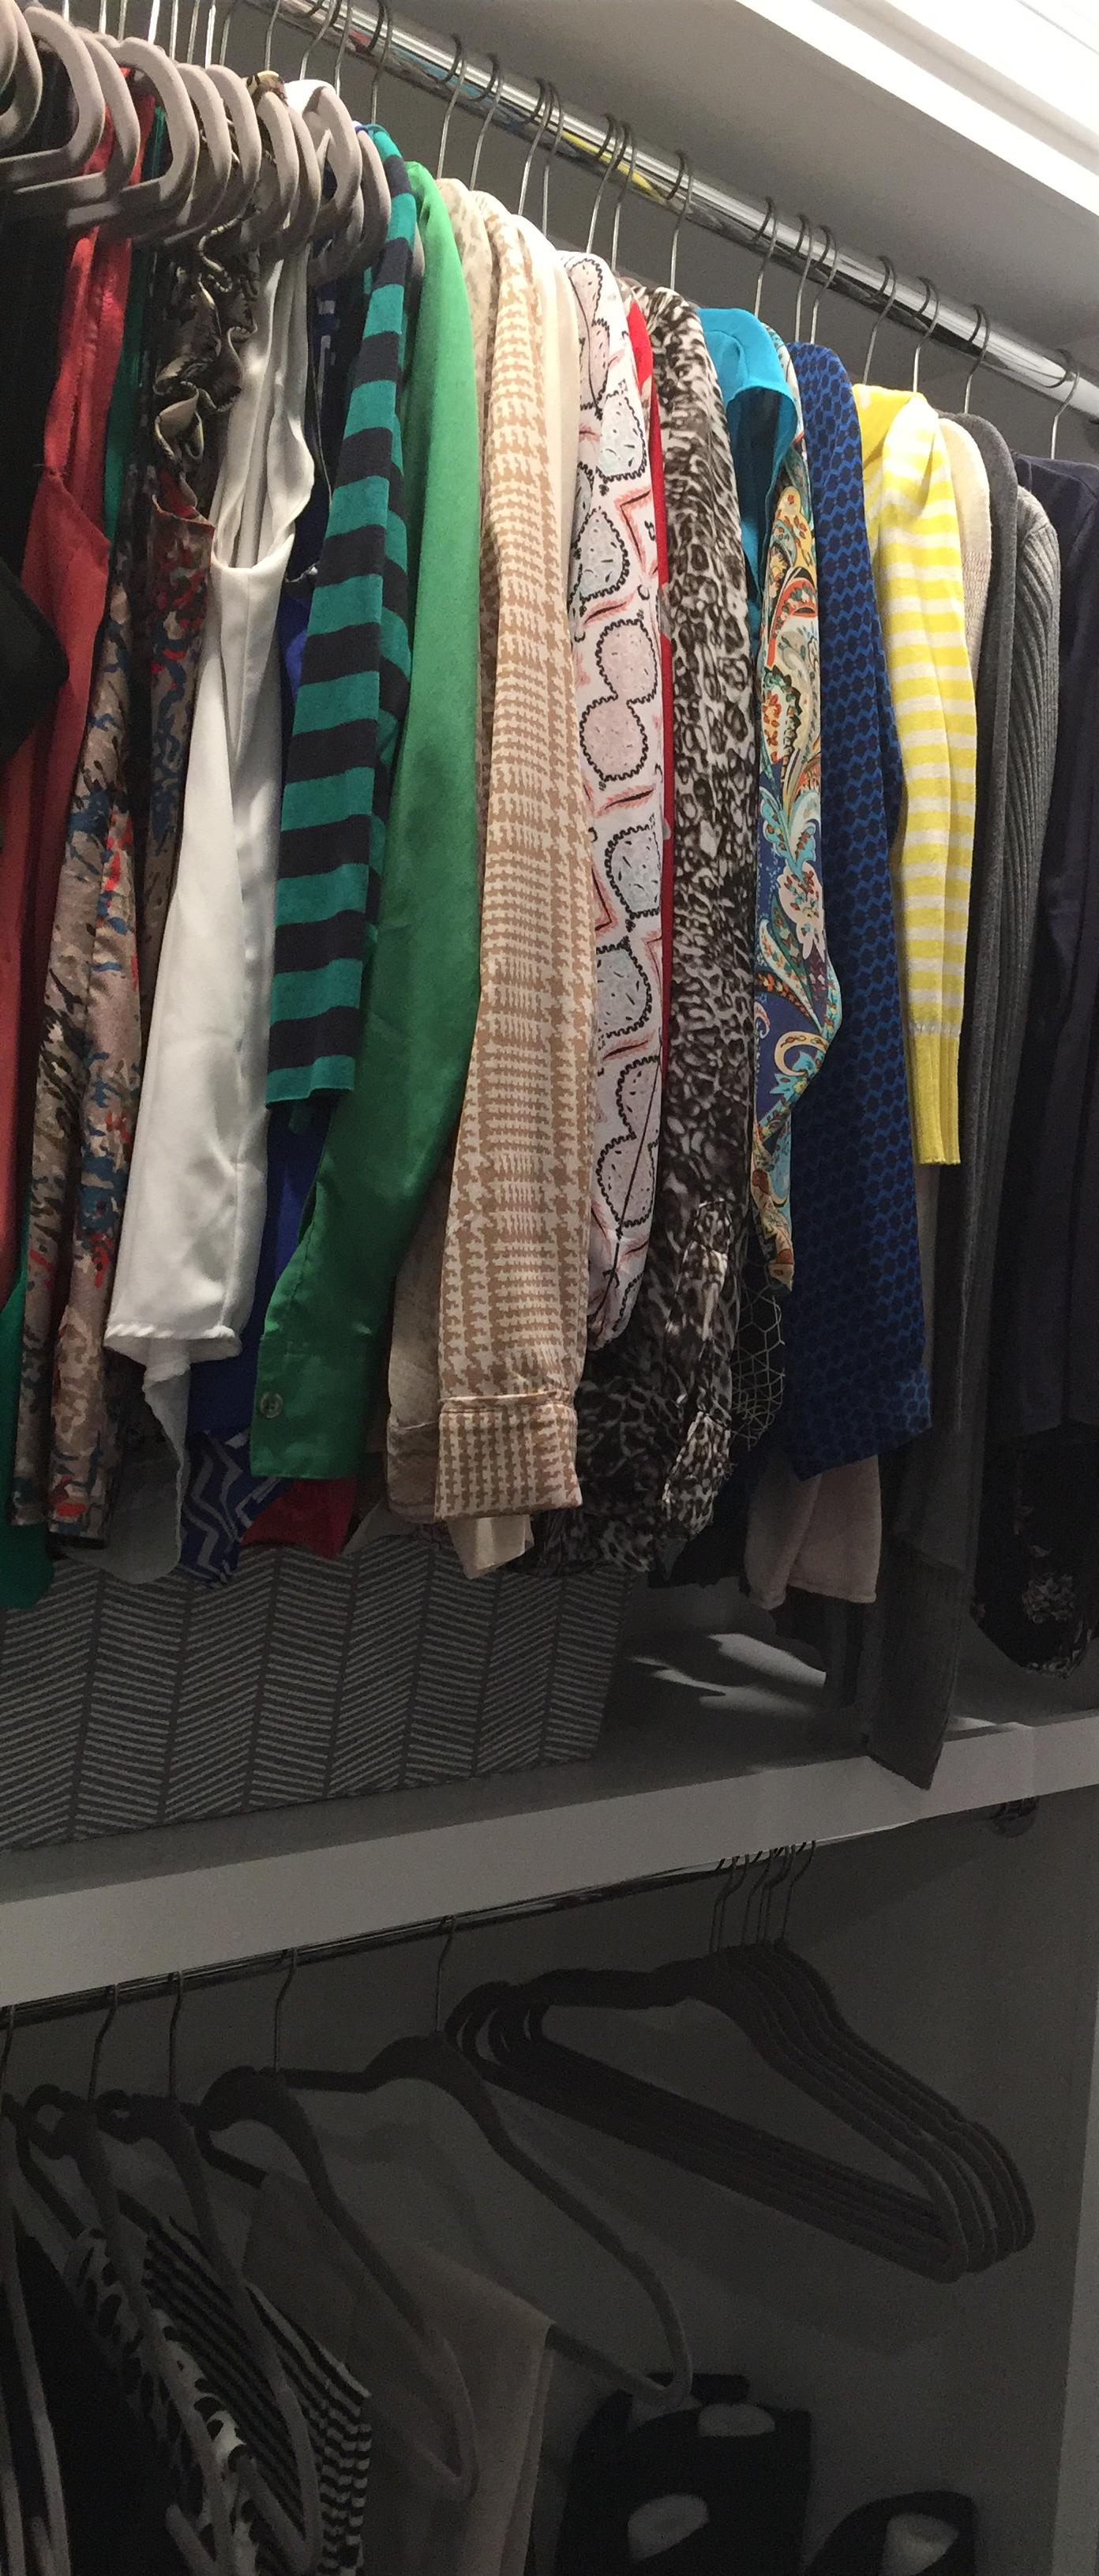 Closet organization in Norwalk, CT